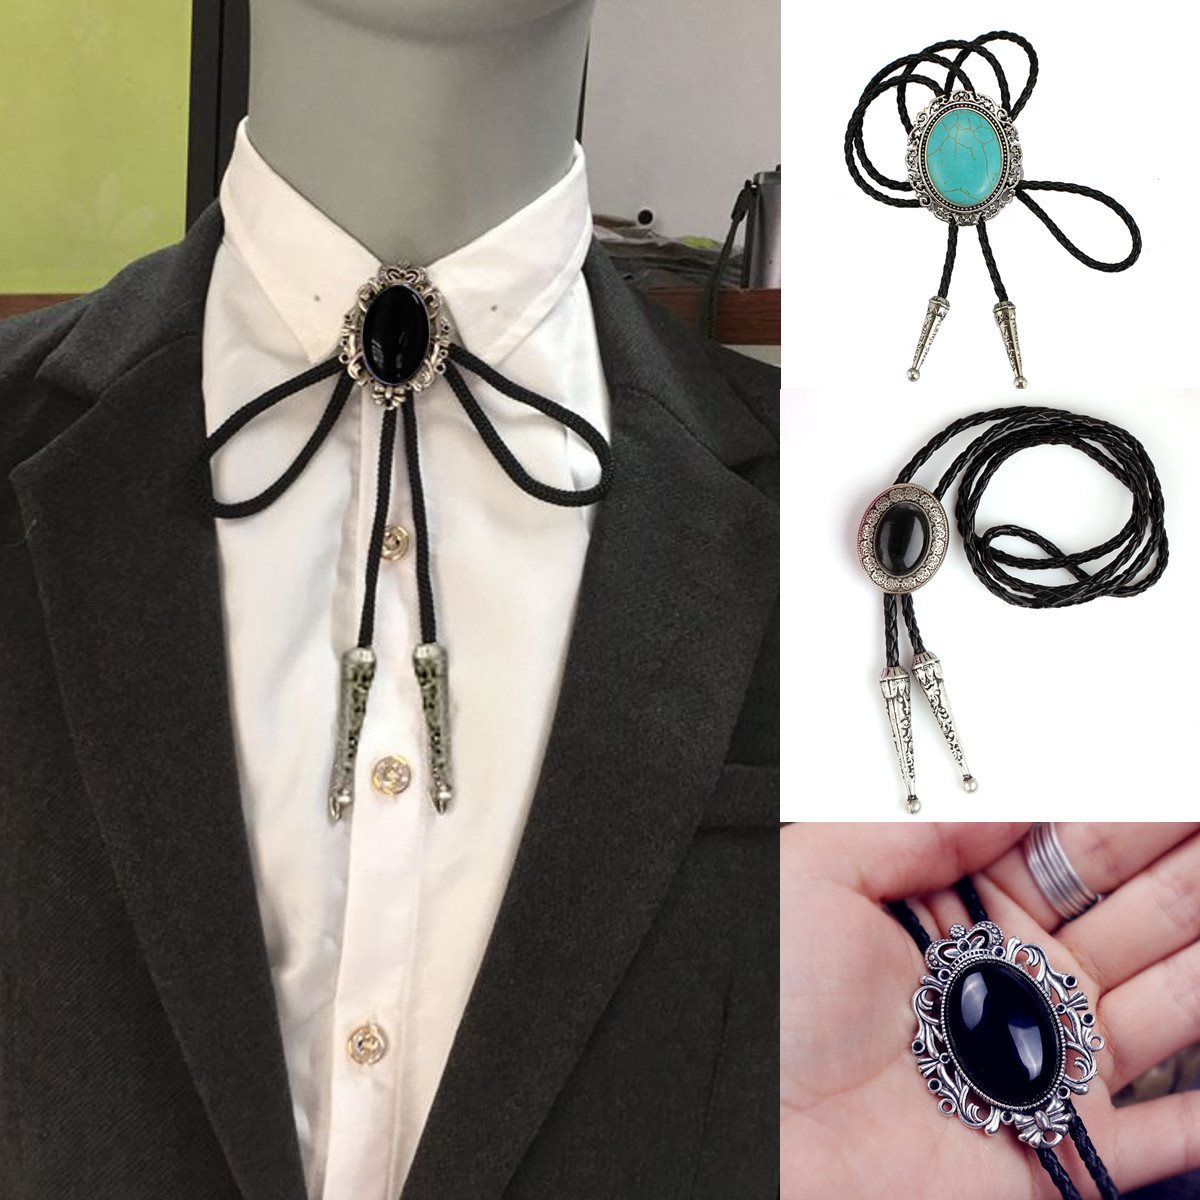 Indian Rhinestone Bolo Tie Dance Bola Tie PU Leather Necklace Flower Necktie Black Opal Western Cowboy Men Chain